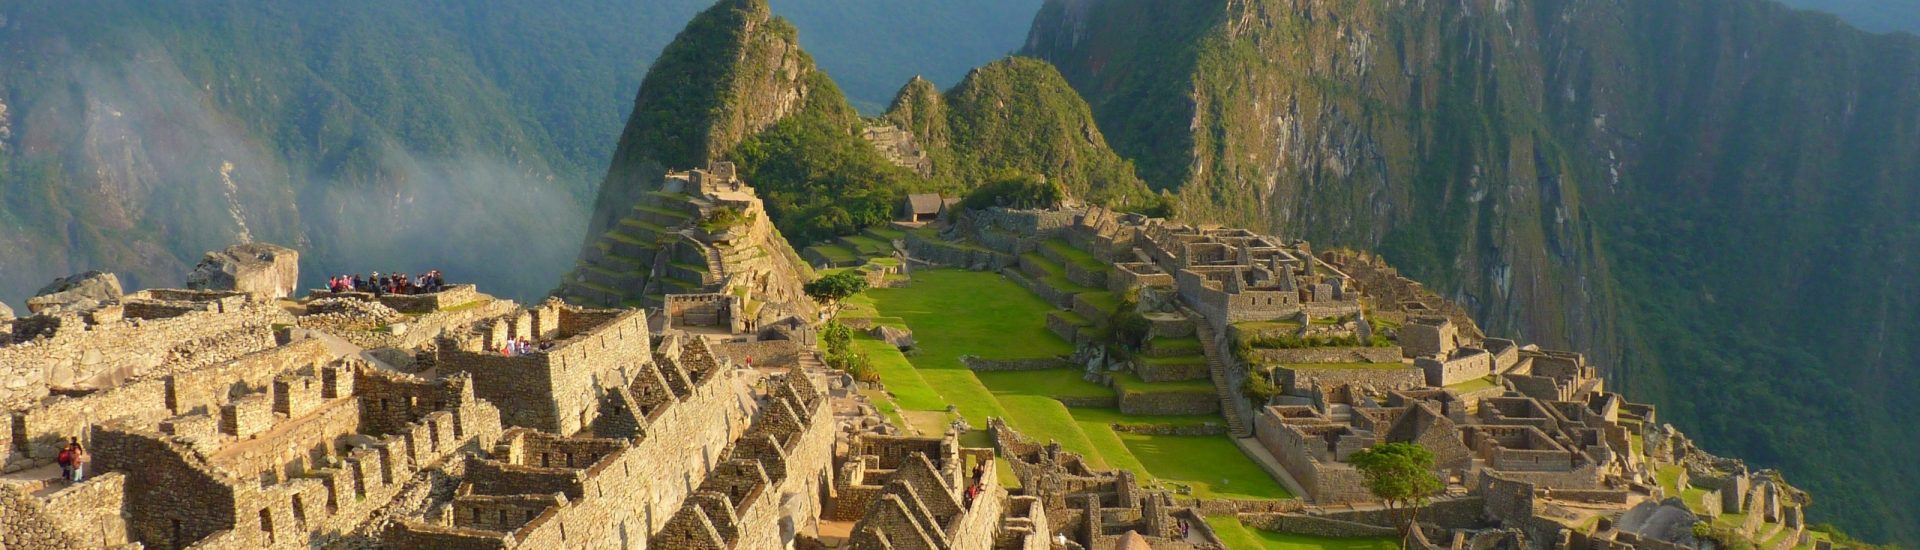 Blog Viagens Machu Picchu_Novas Regras Machu Picchu